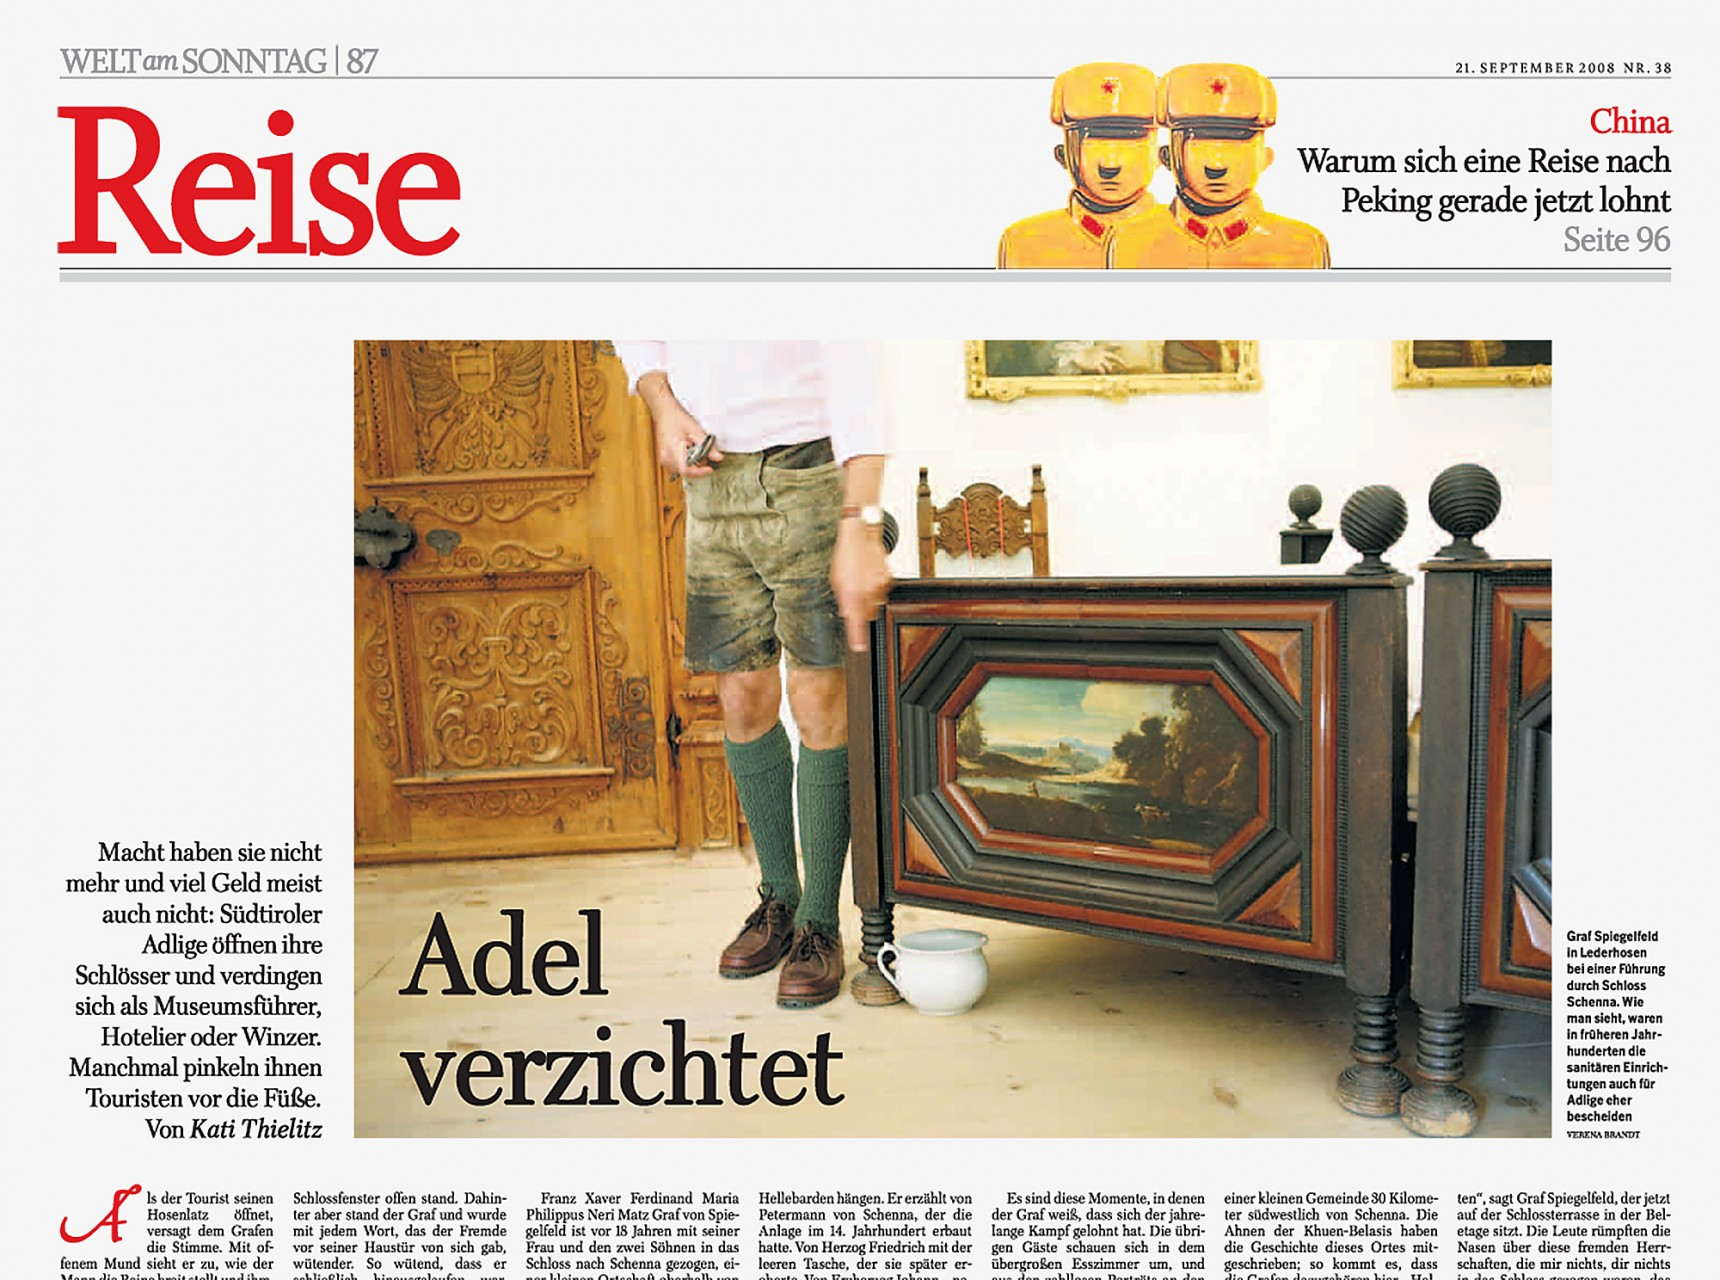 """Adel verzichtet"" / Welt am Sonntag"